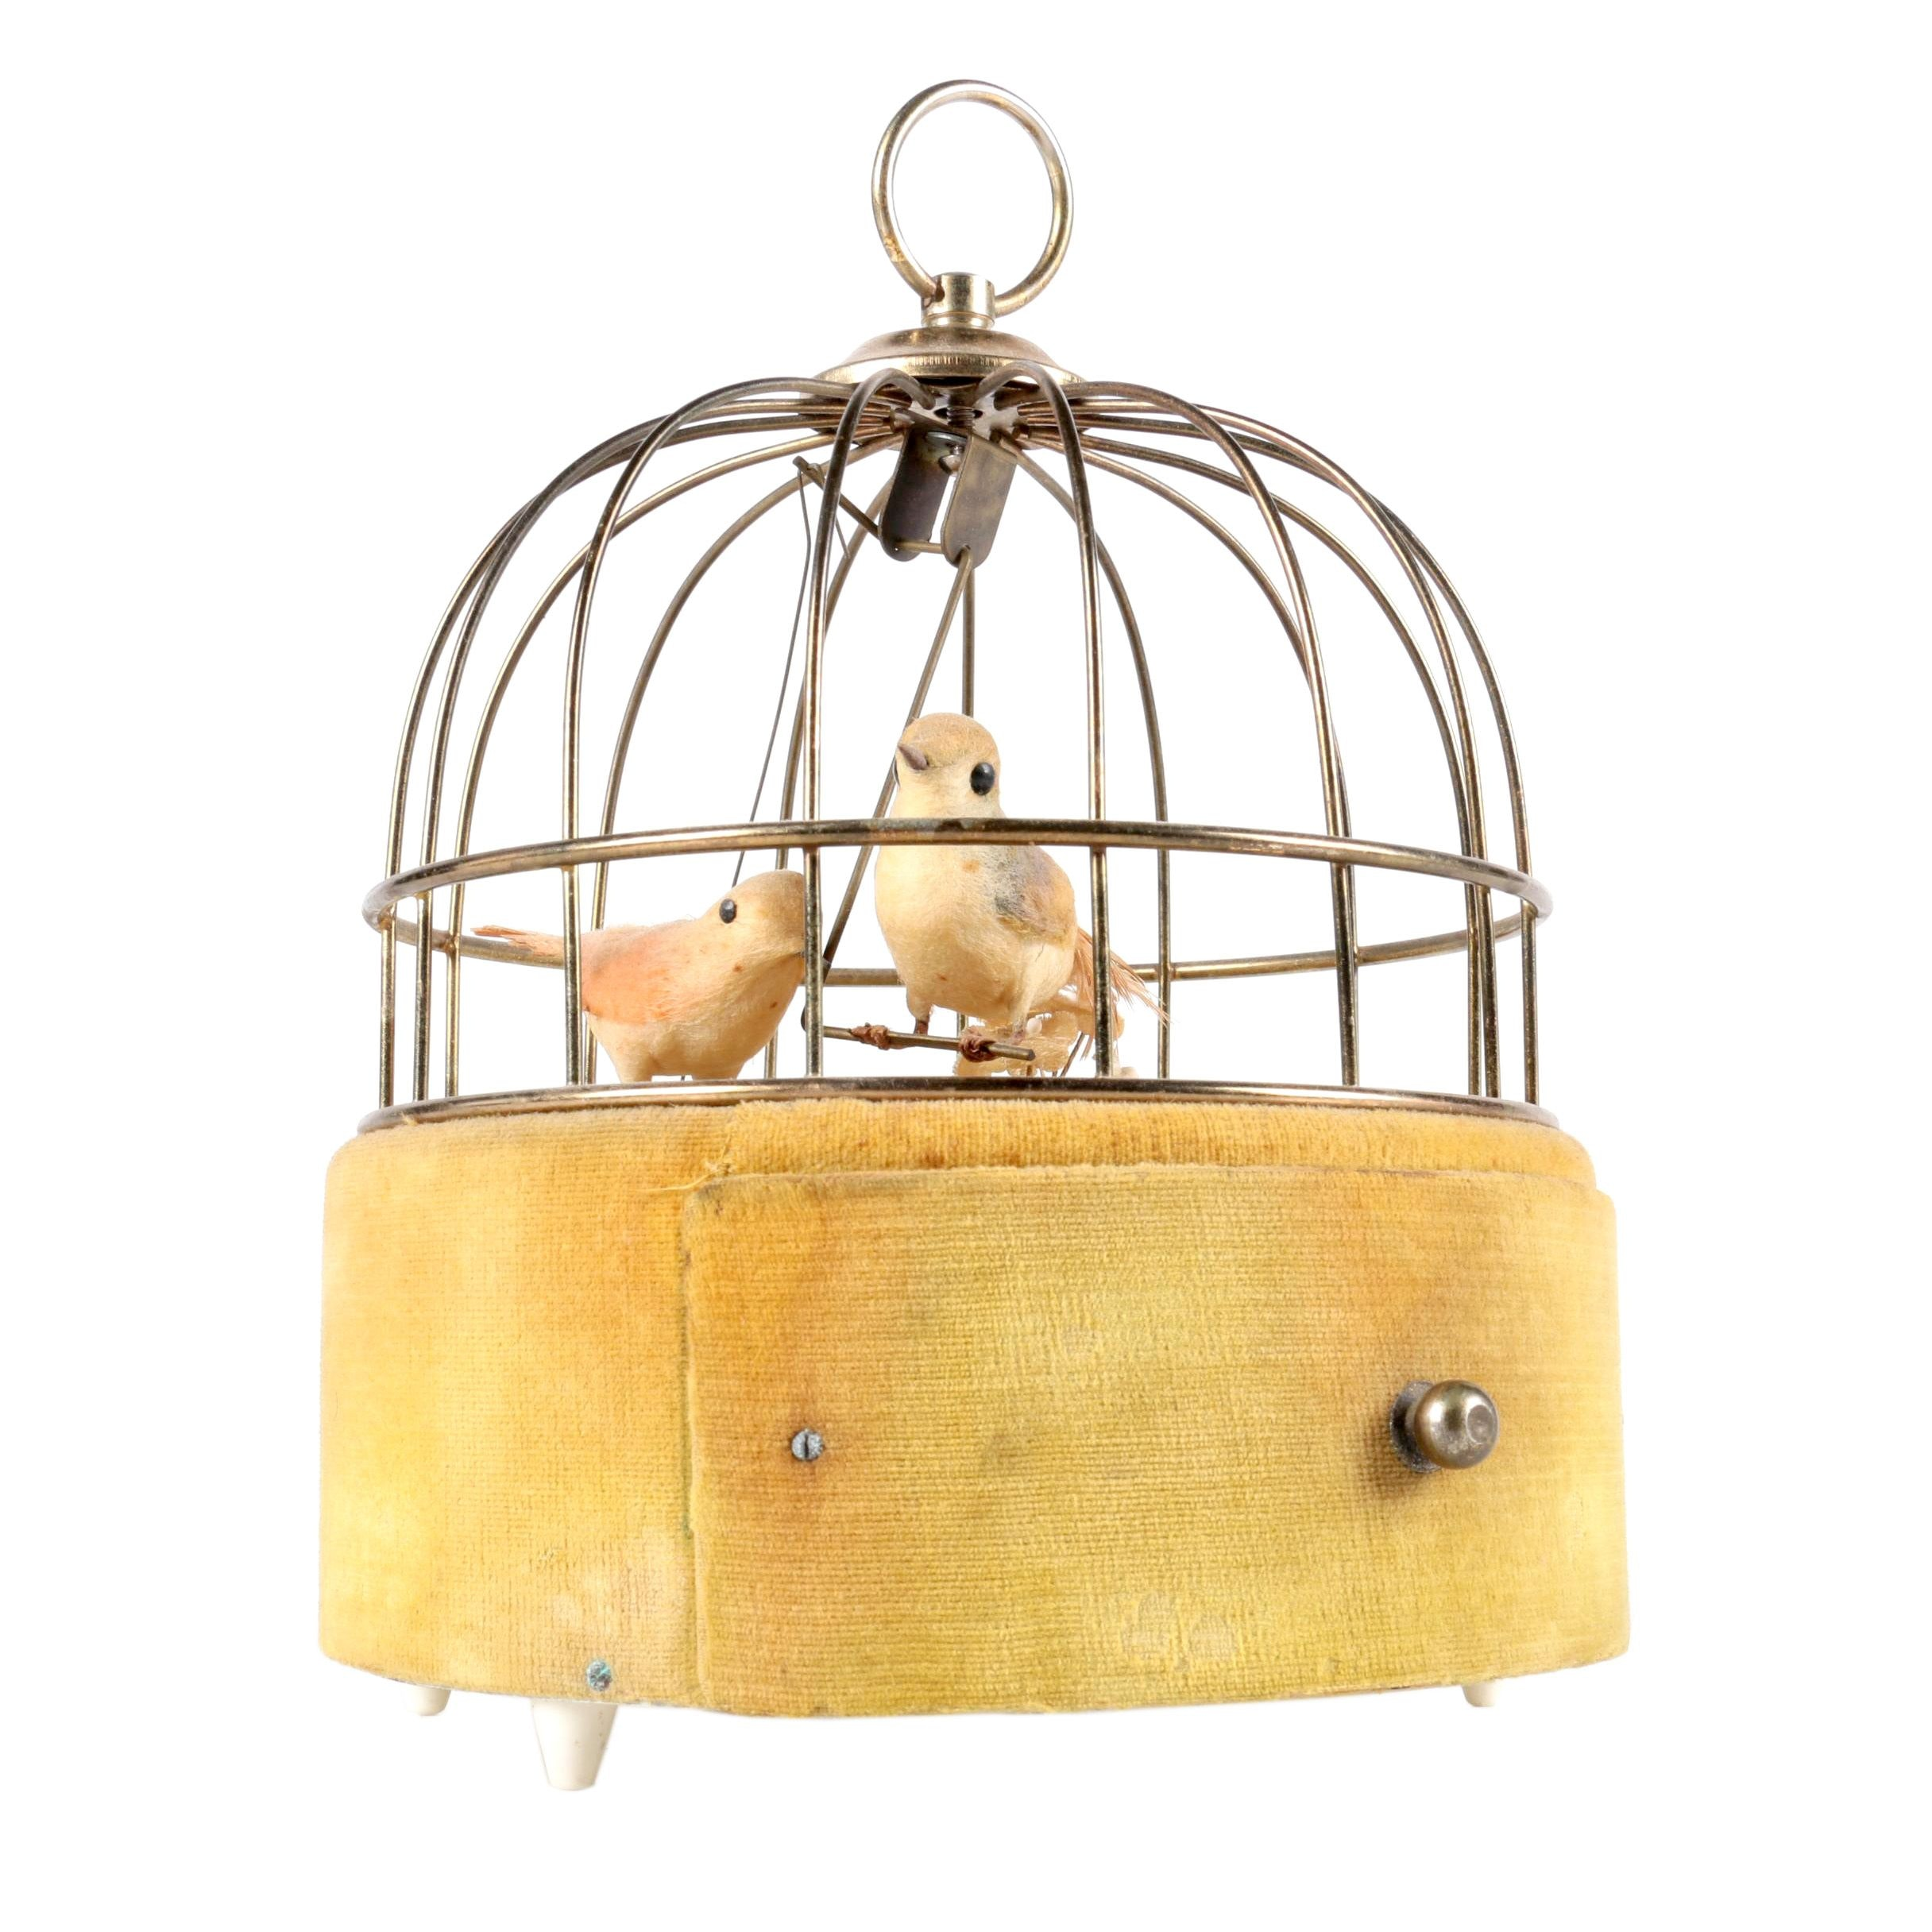 Vintage Mechanical Musical Birdcage